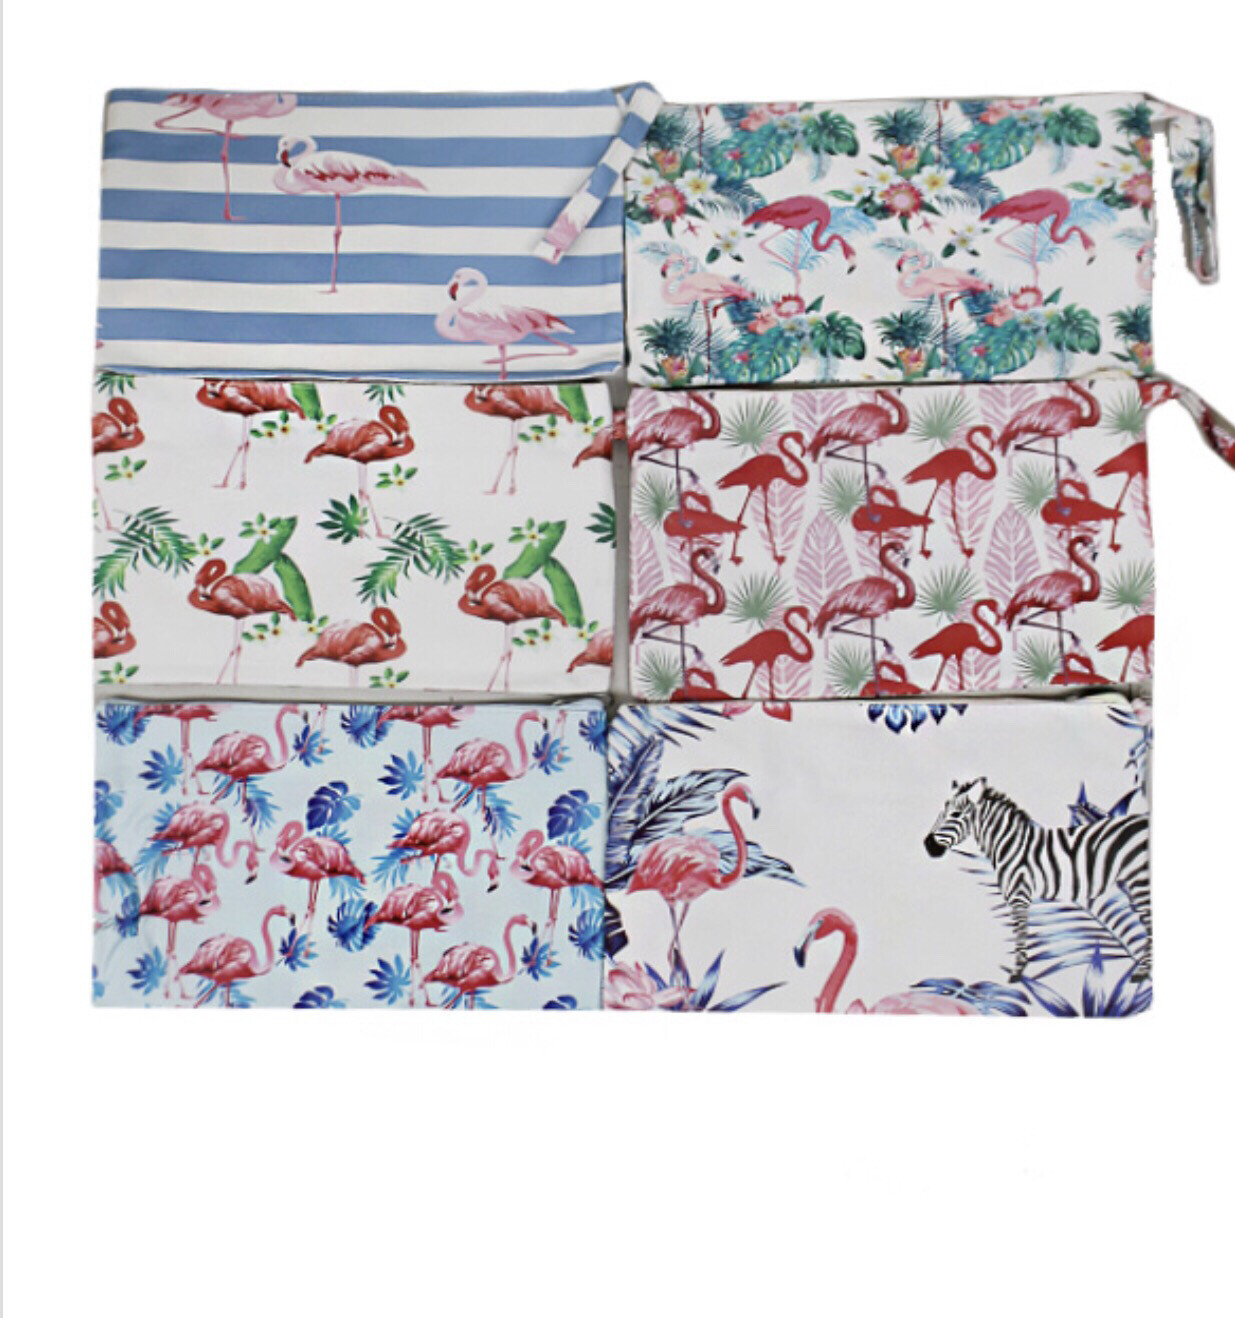 Flamingo Designed Wallets